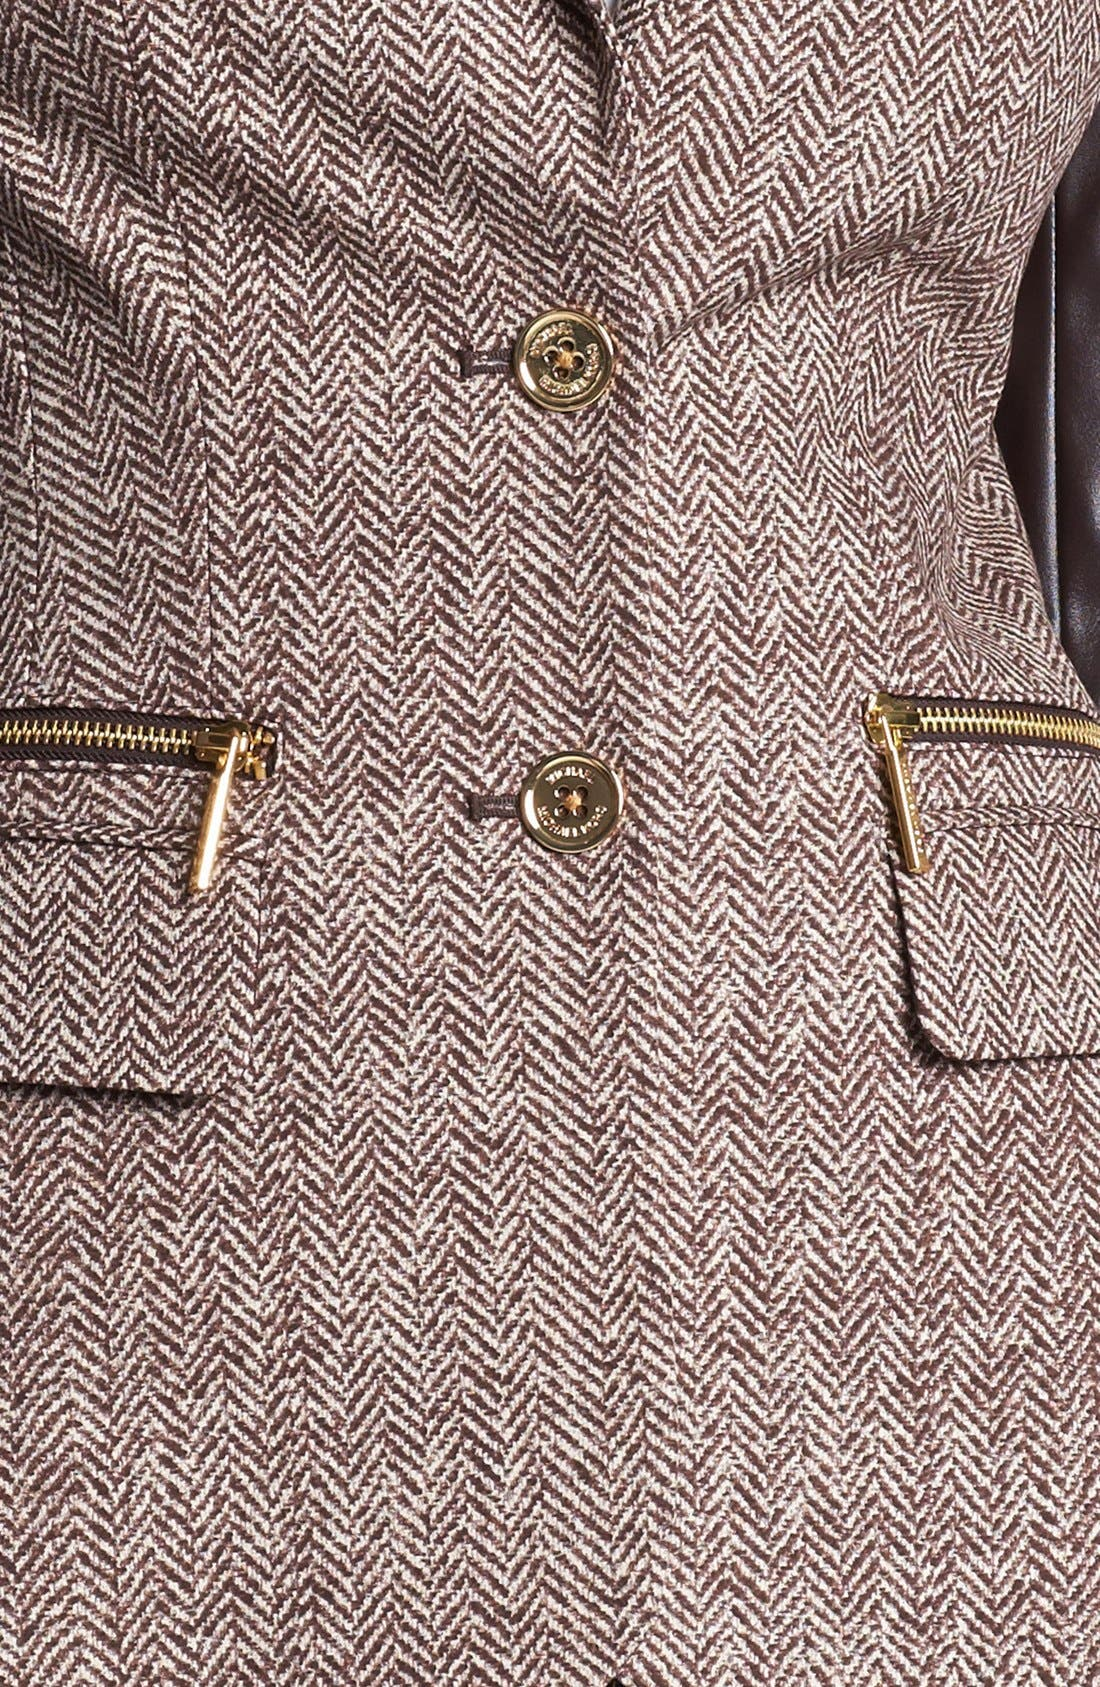 Alternate Image 3  - MICHAEL Michael Kors Faux Leather Sleeve Tweed Blazer